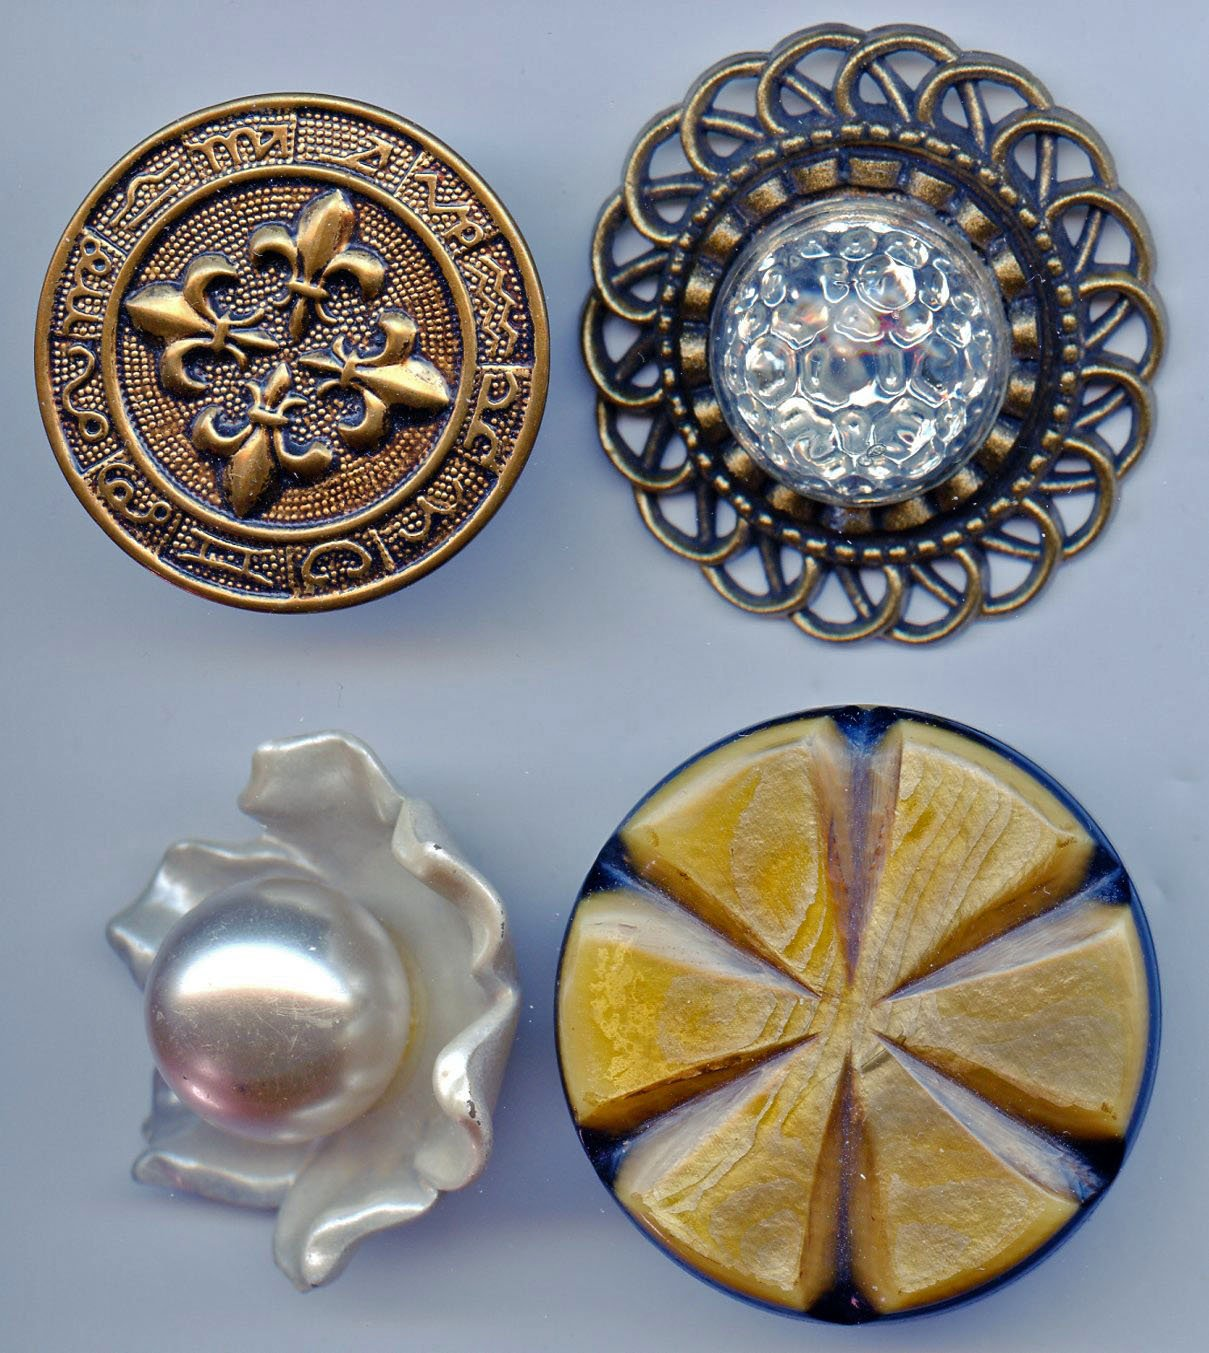 4 large size vintage buttons